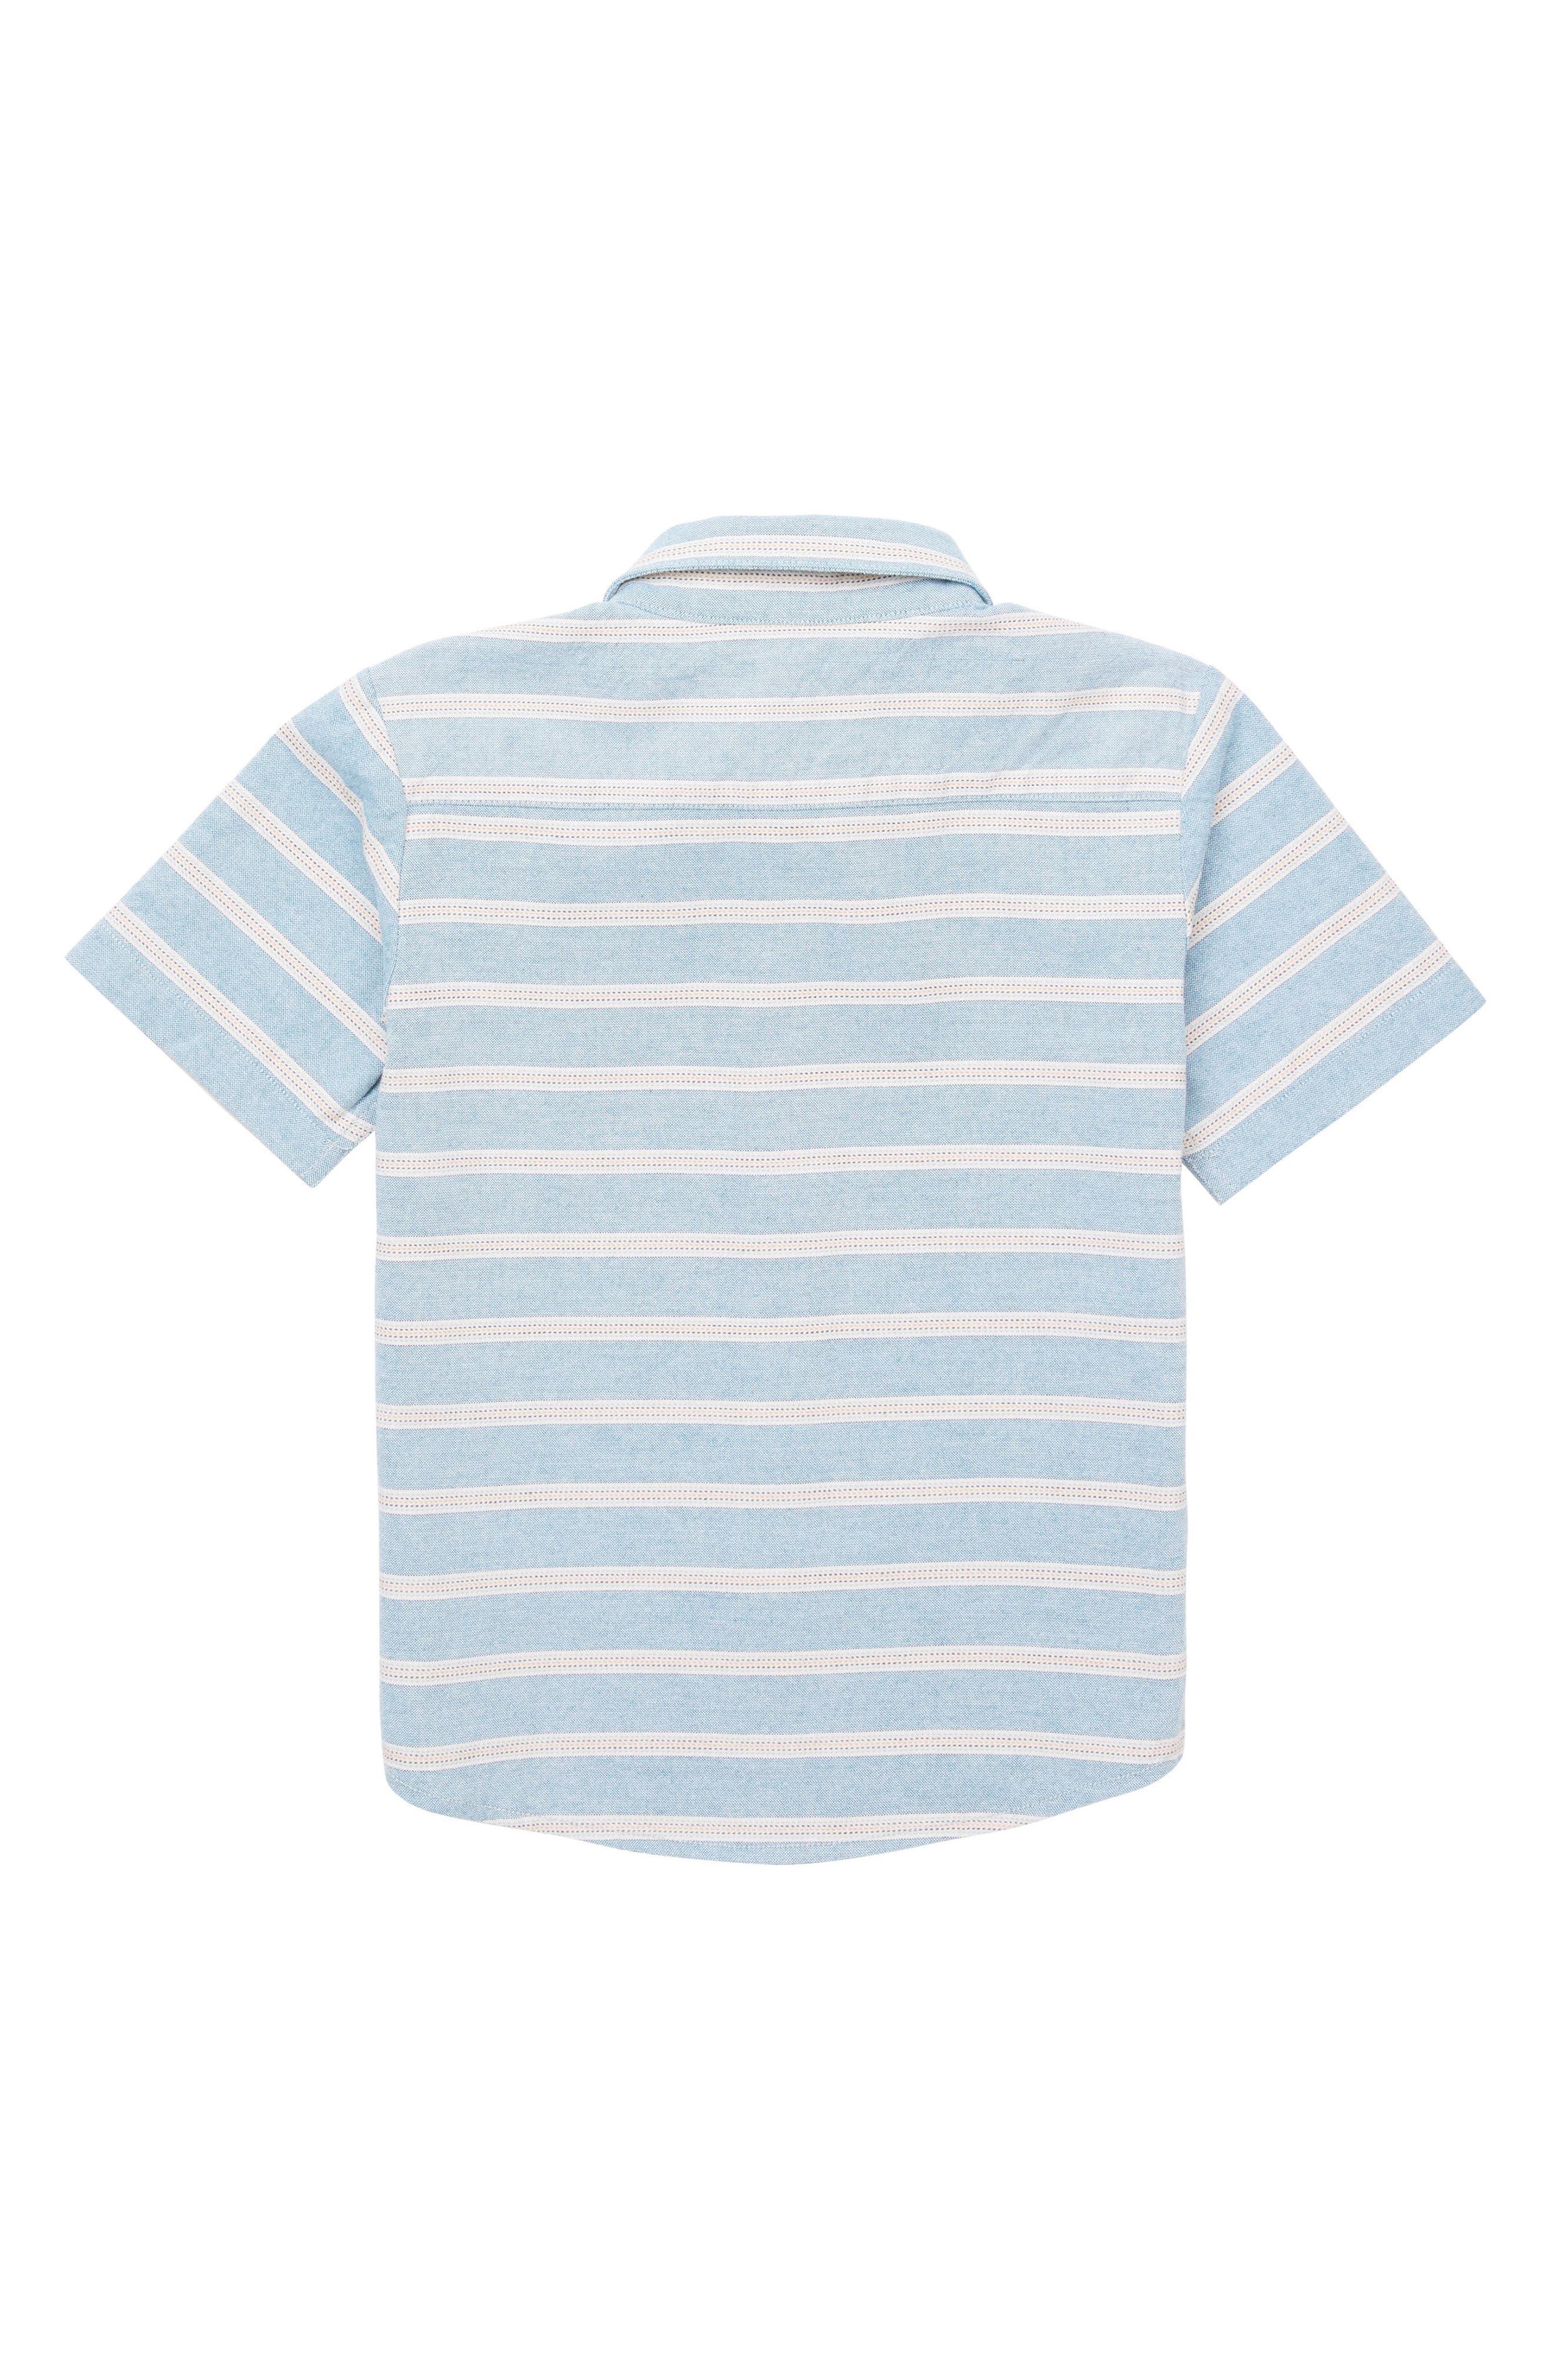 Branson Stripe Woven Shirt,                             Alternate thumbnail 2, color,                             Vintage Blue